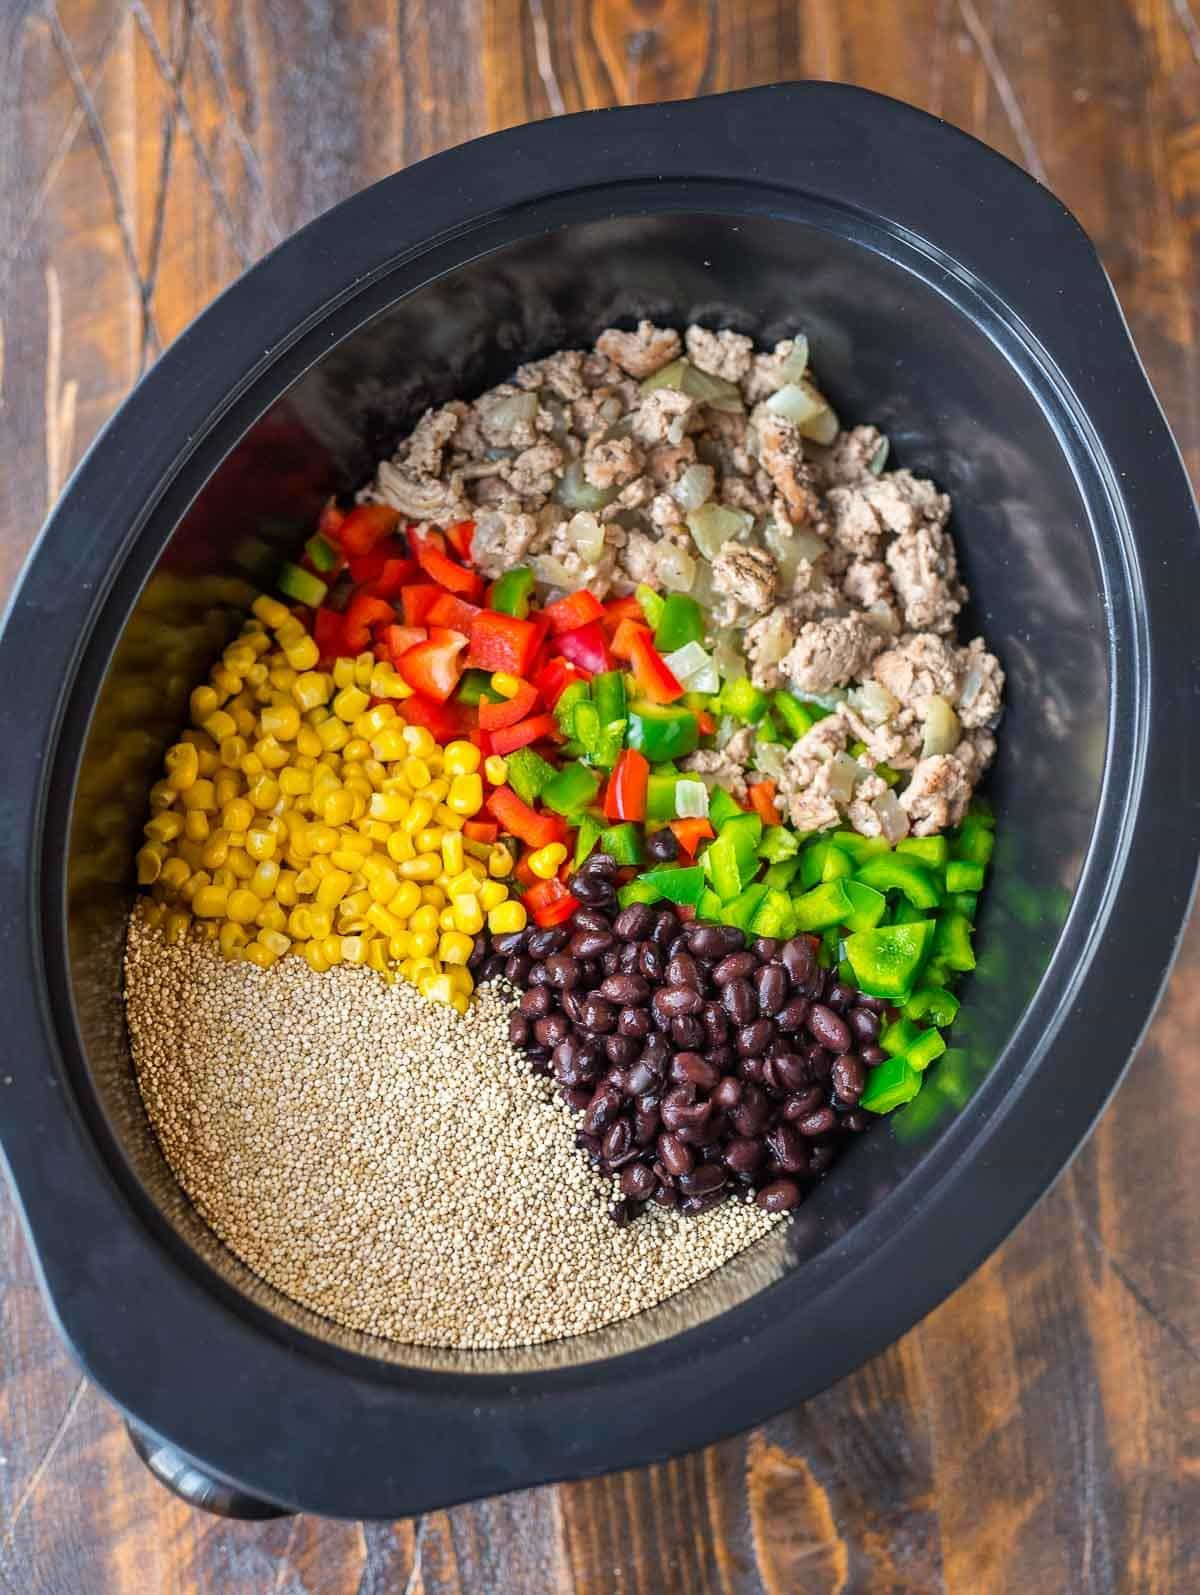 Healthy Ground Turkey Crock Pot Recipes  Crock Pot Mexican Casserole